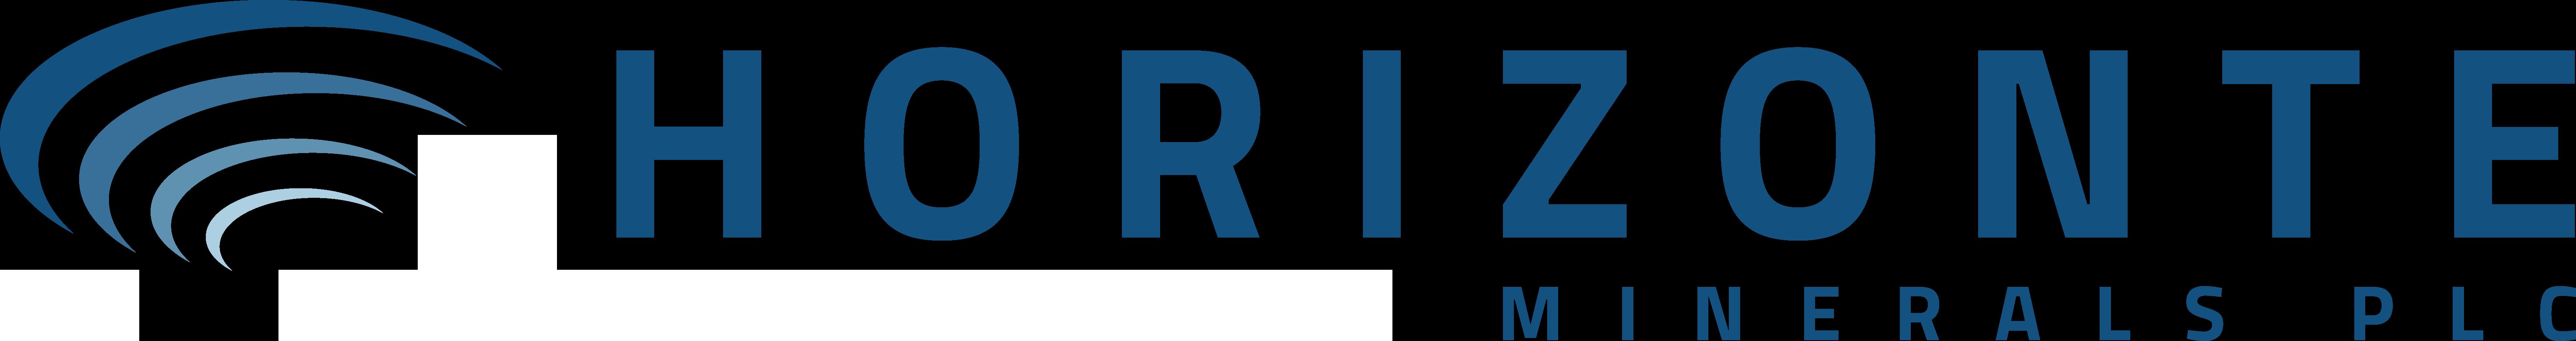 Horizonte Minerals Plc Logo